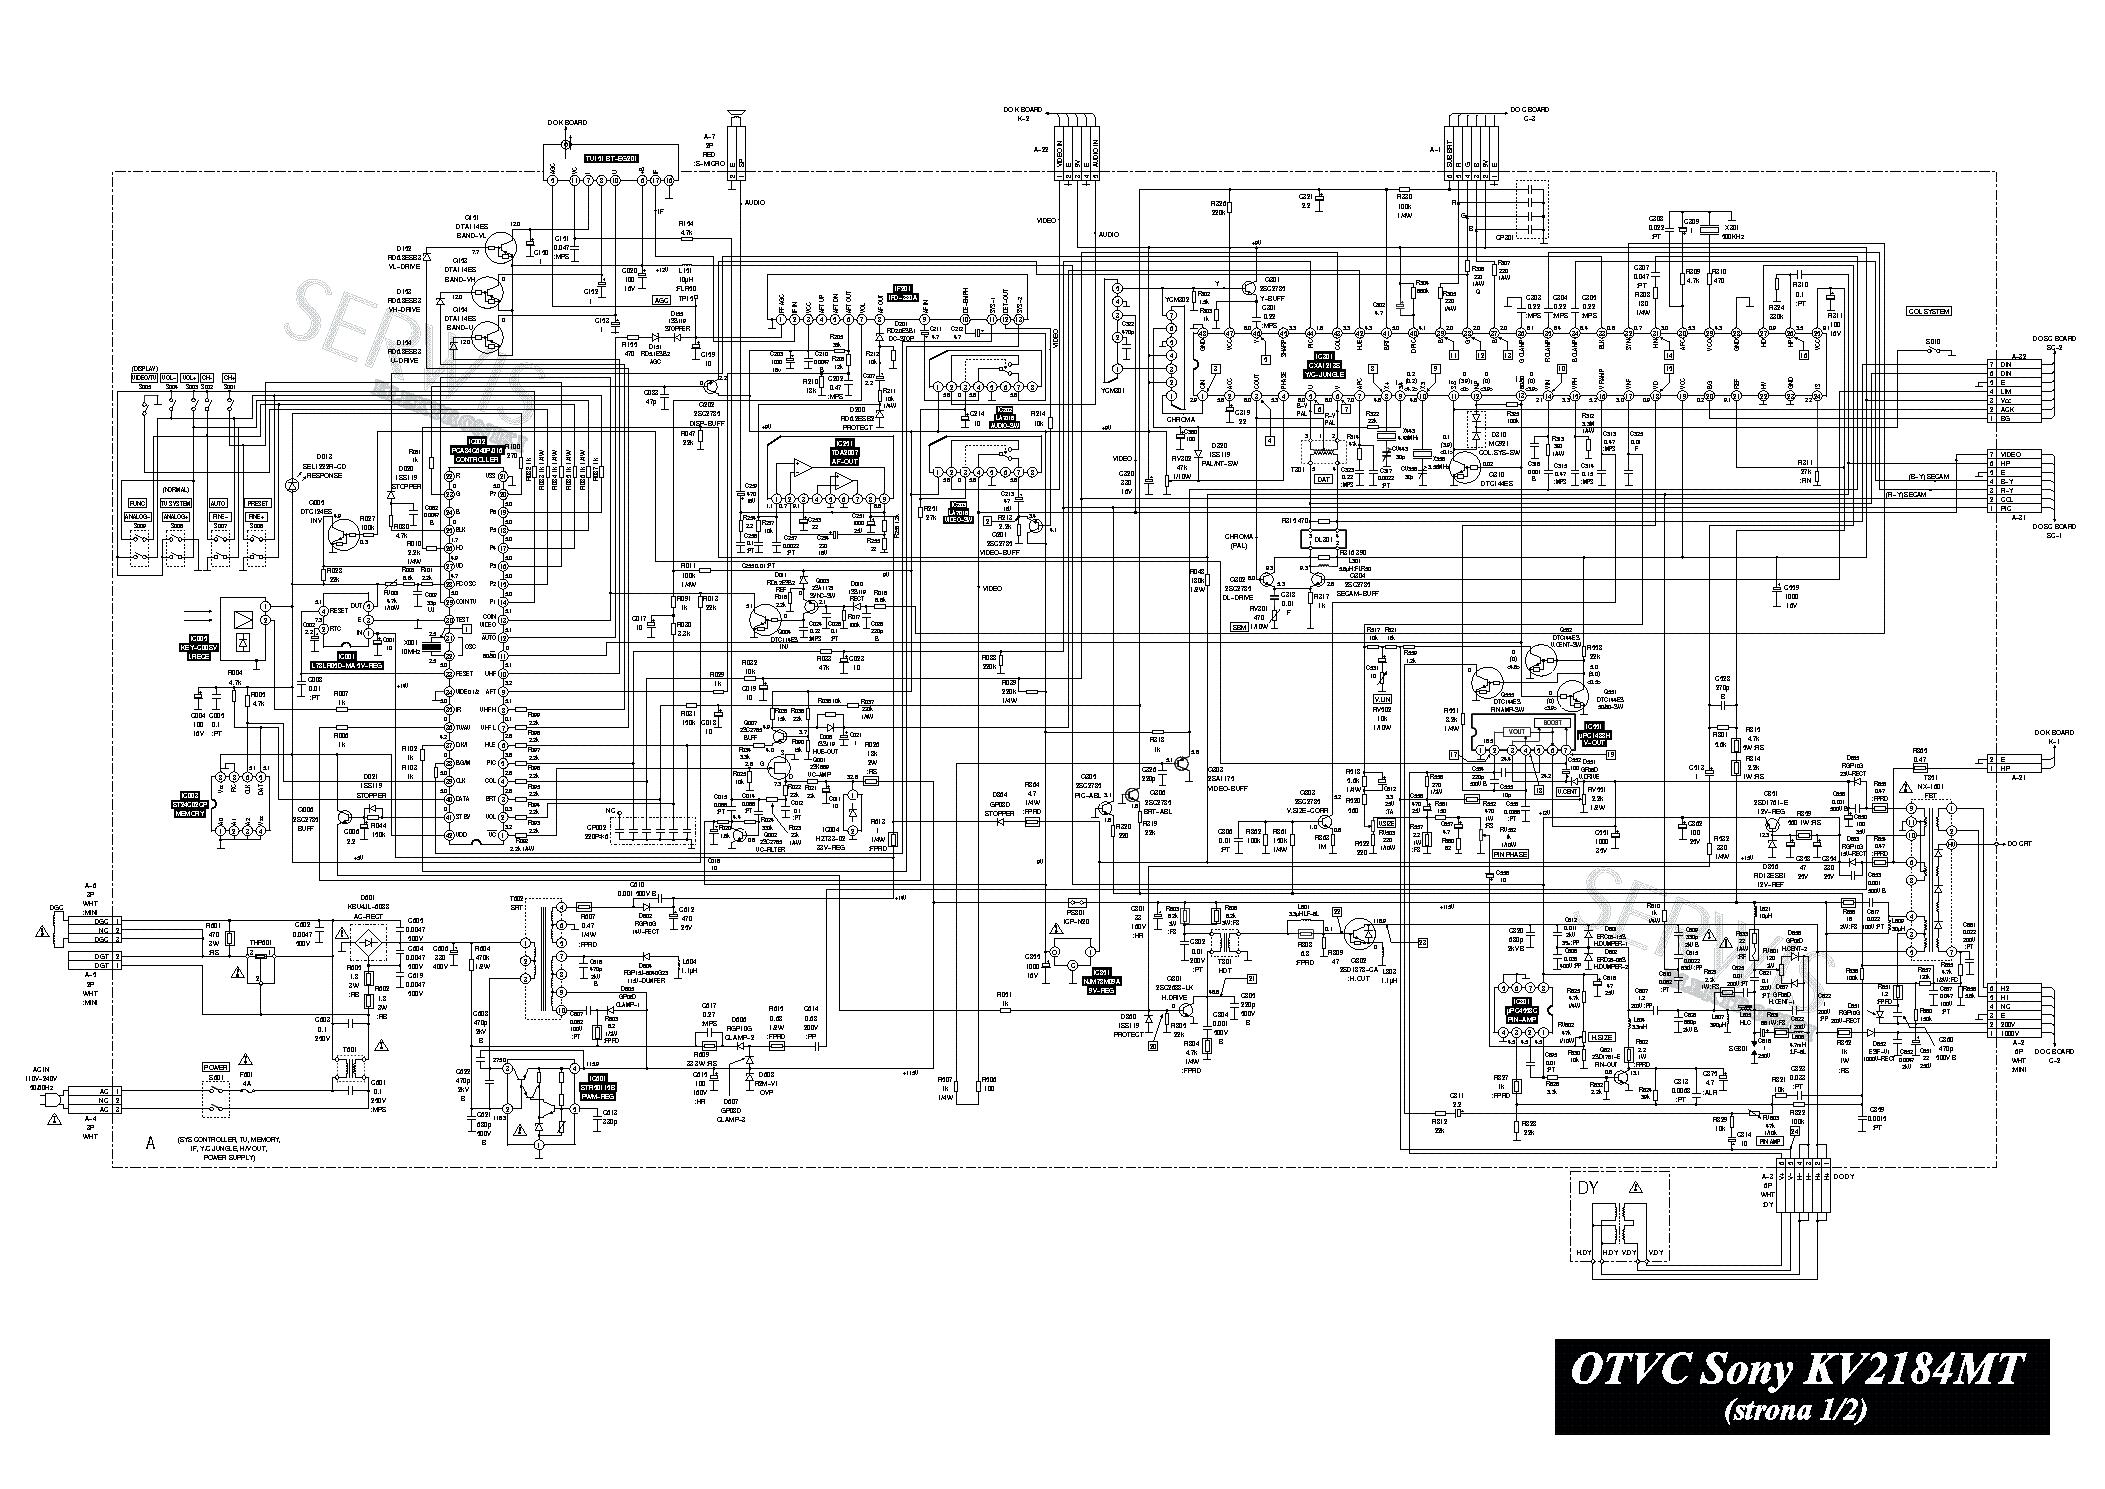 yaesu ft 470 service manual